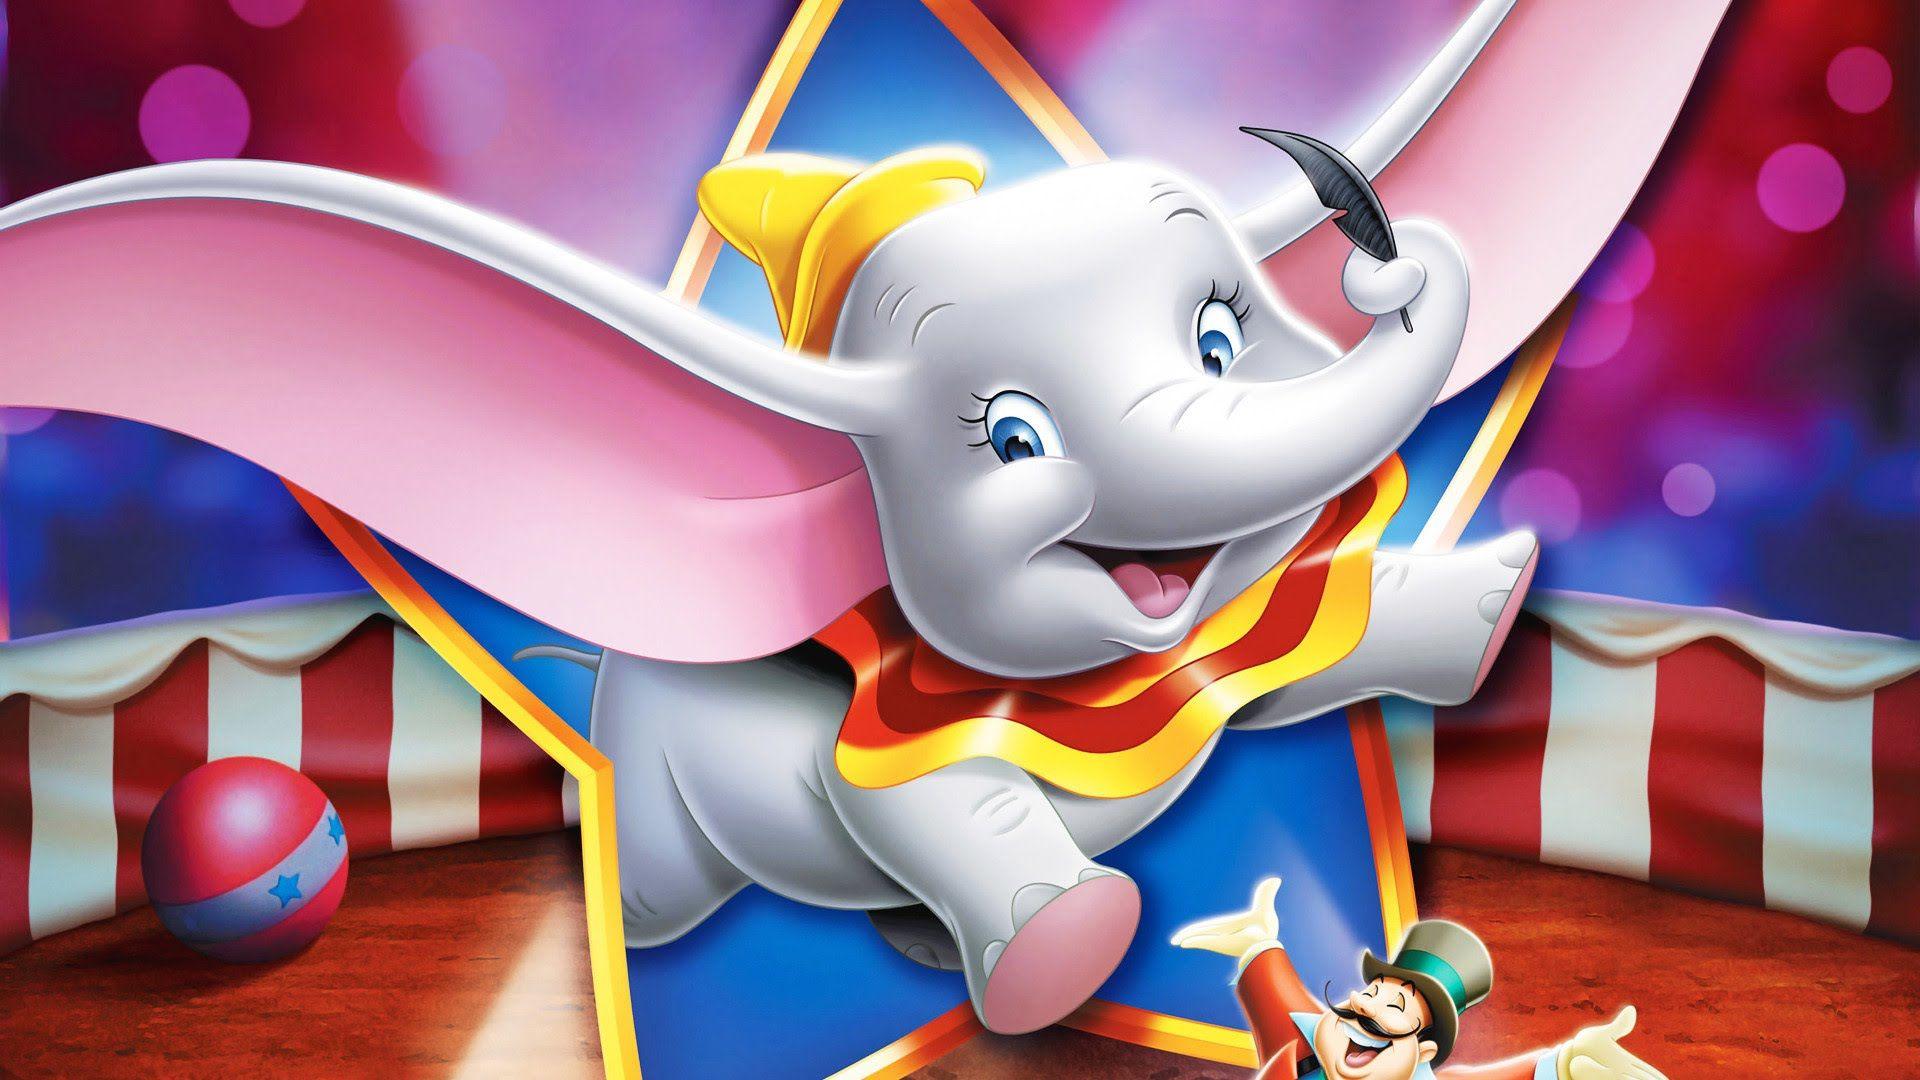 Dumbo film completo in italiano filma film completi film